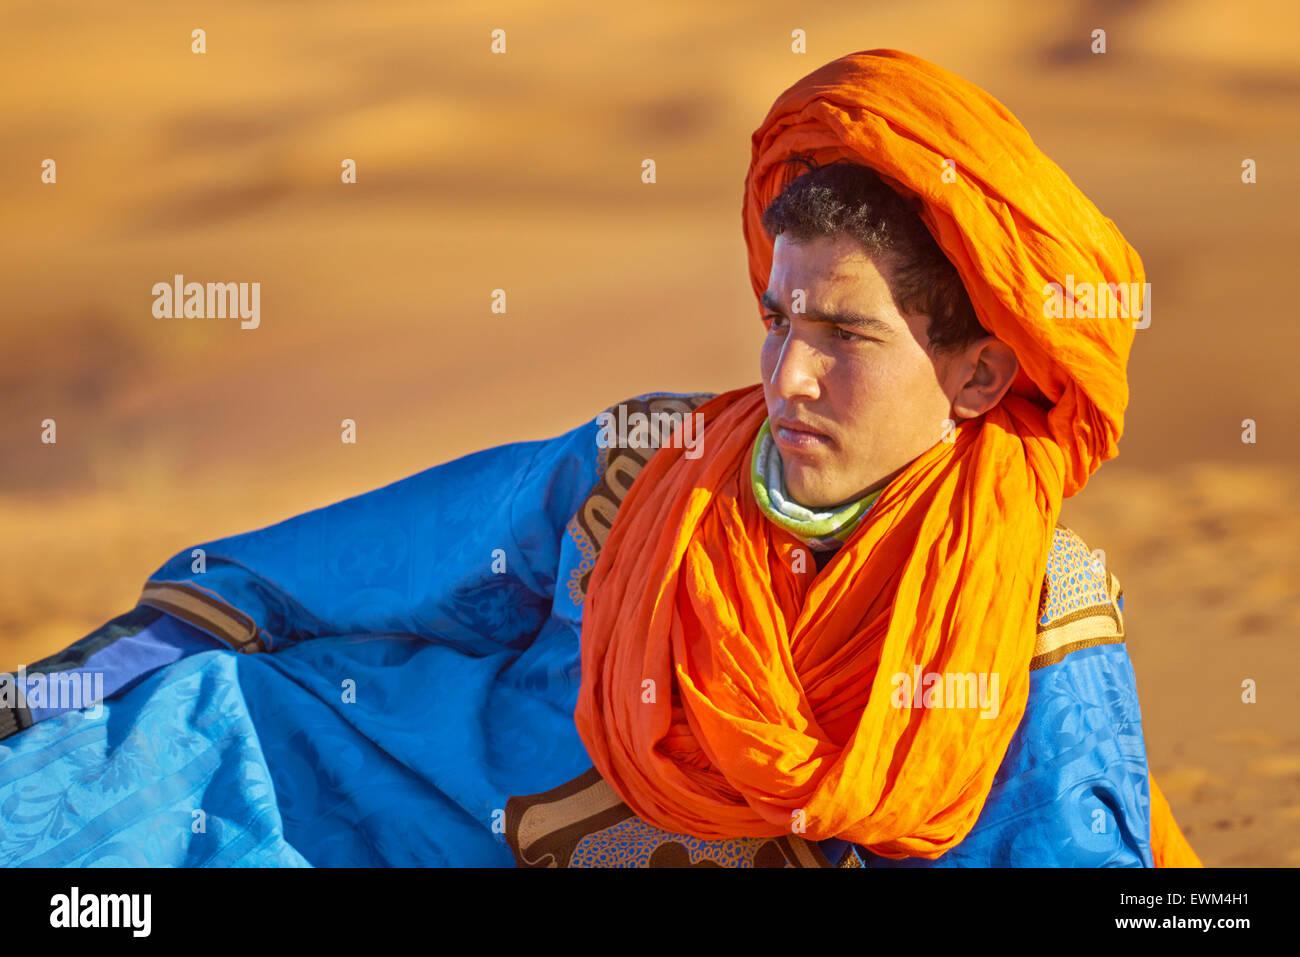 Young Berber man wearing a djellaba and turban, portrait, Egr Chebbi, Sahara, Morocco - Stock Image